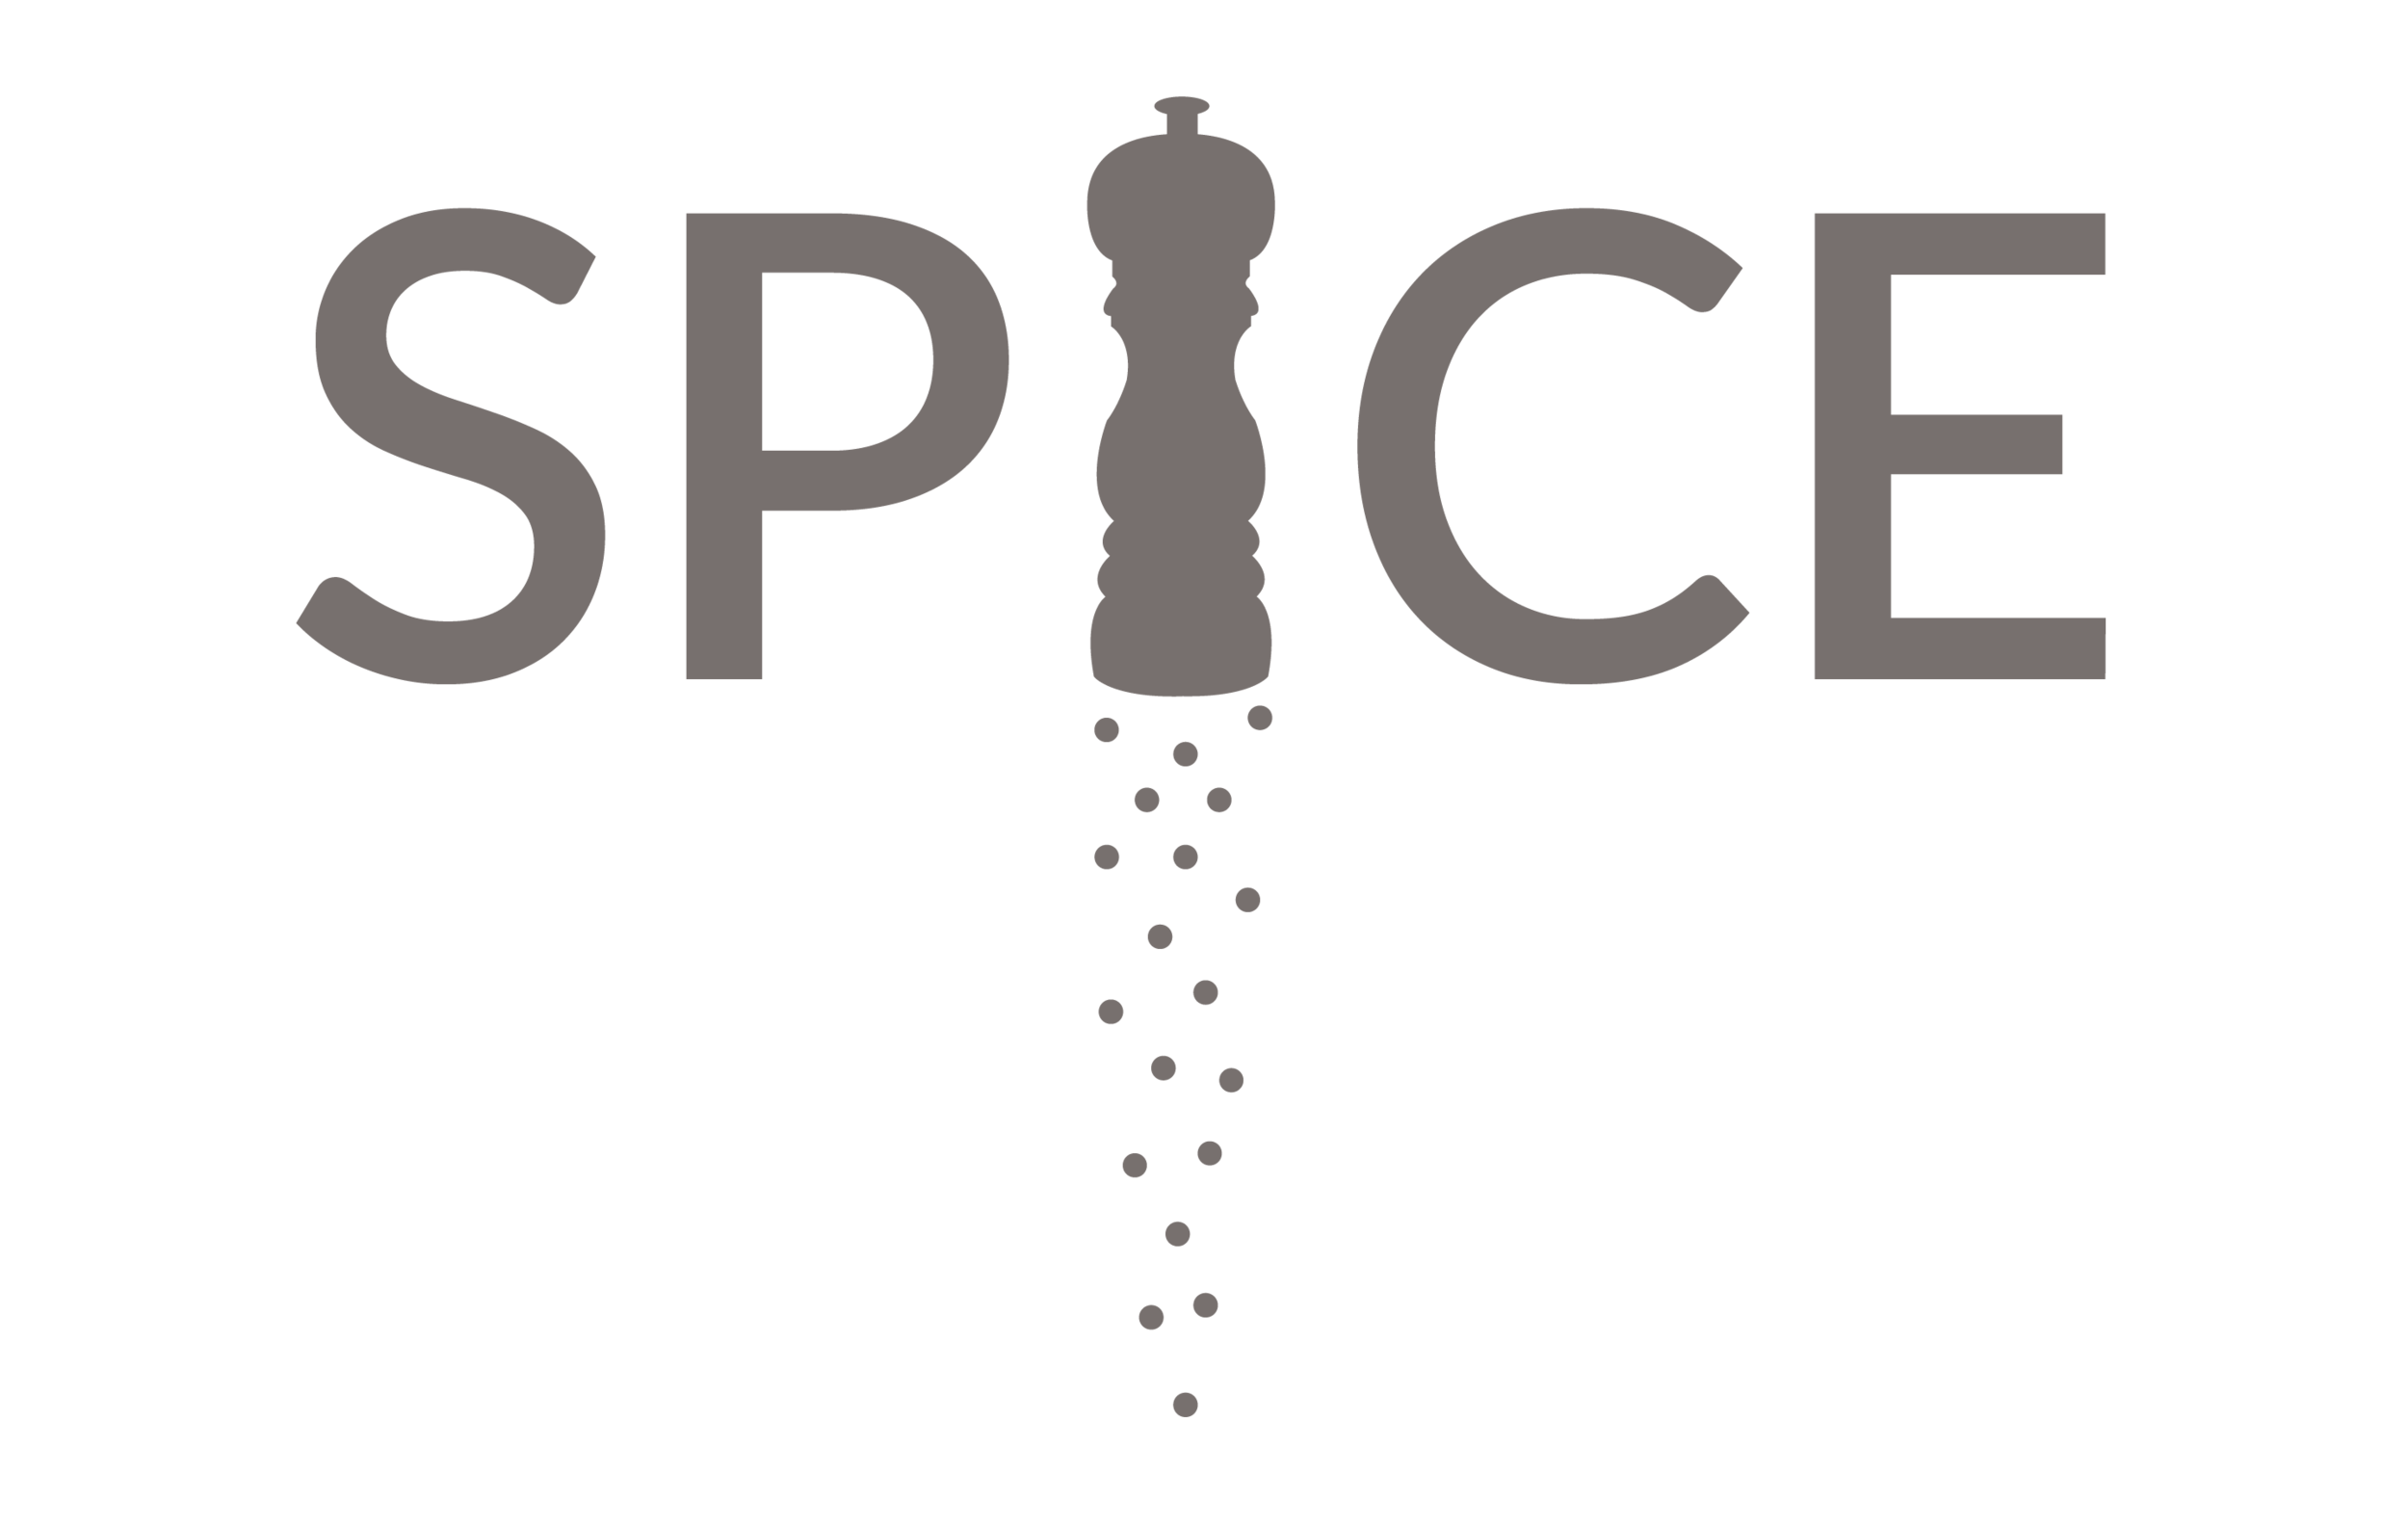 gray-logo-17.png